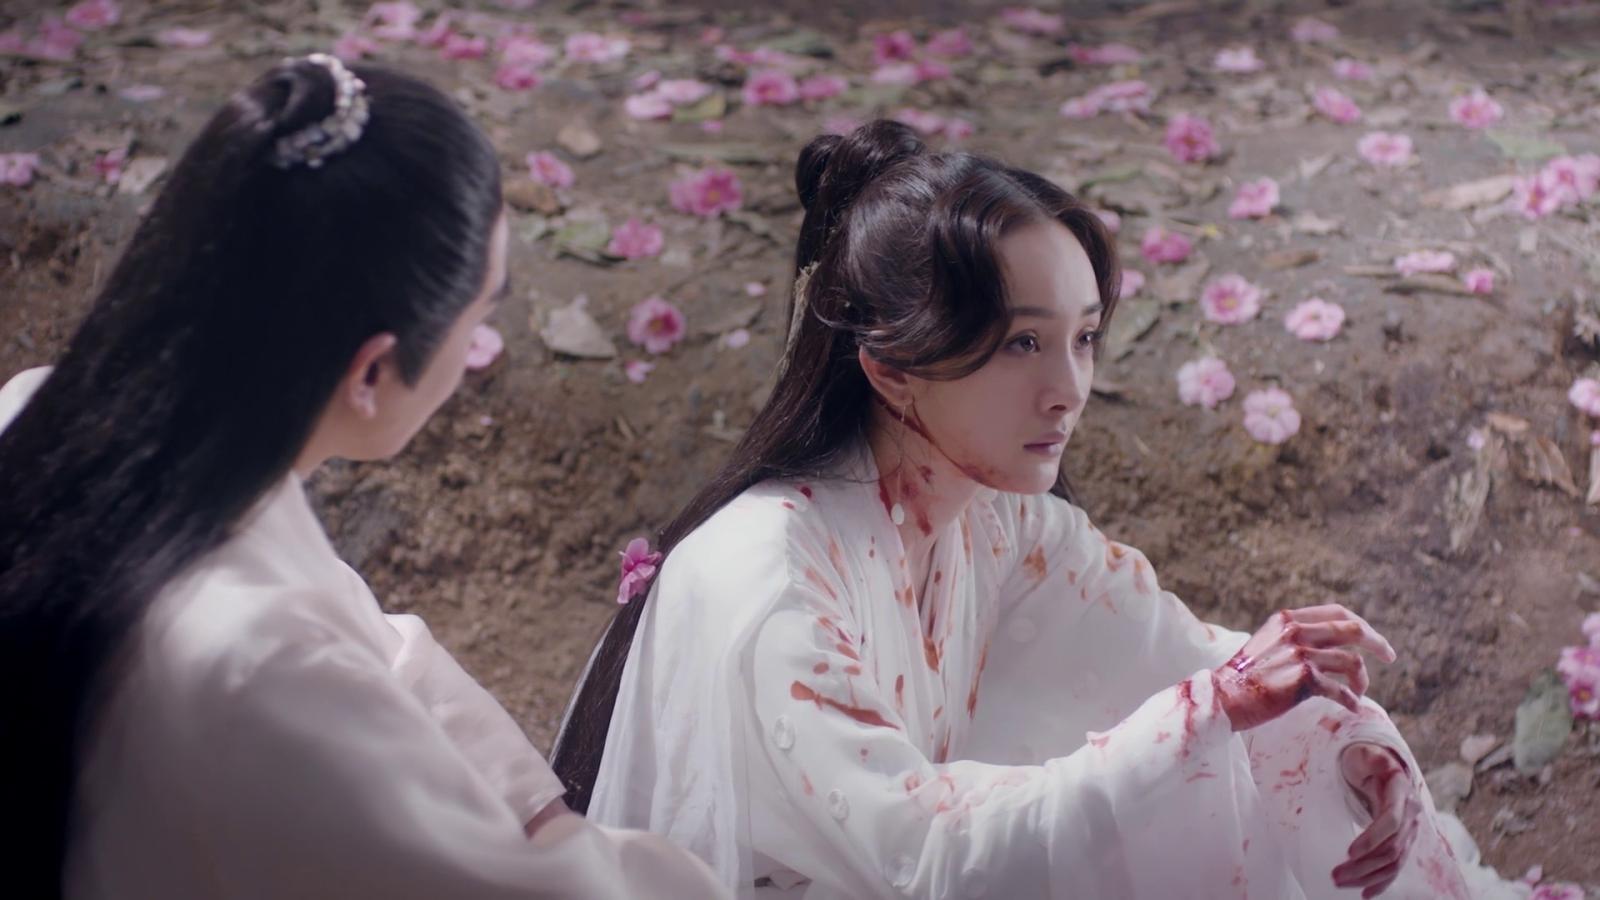 Ten Miles of Peach Blossoms 三生三世十里桃花 - Episode 26